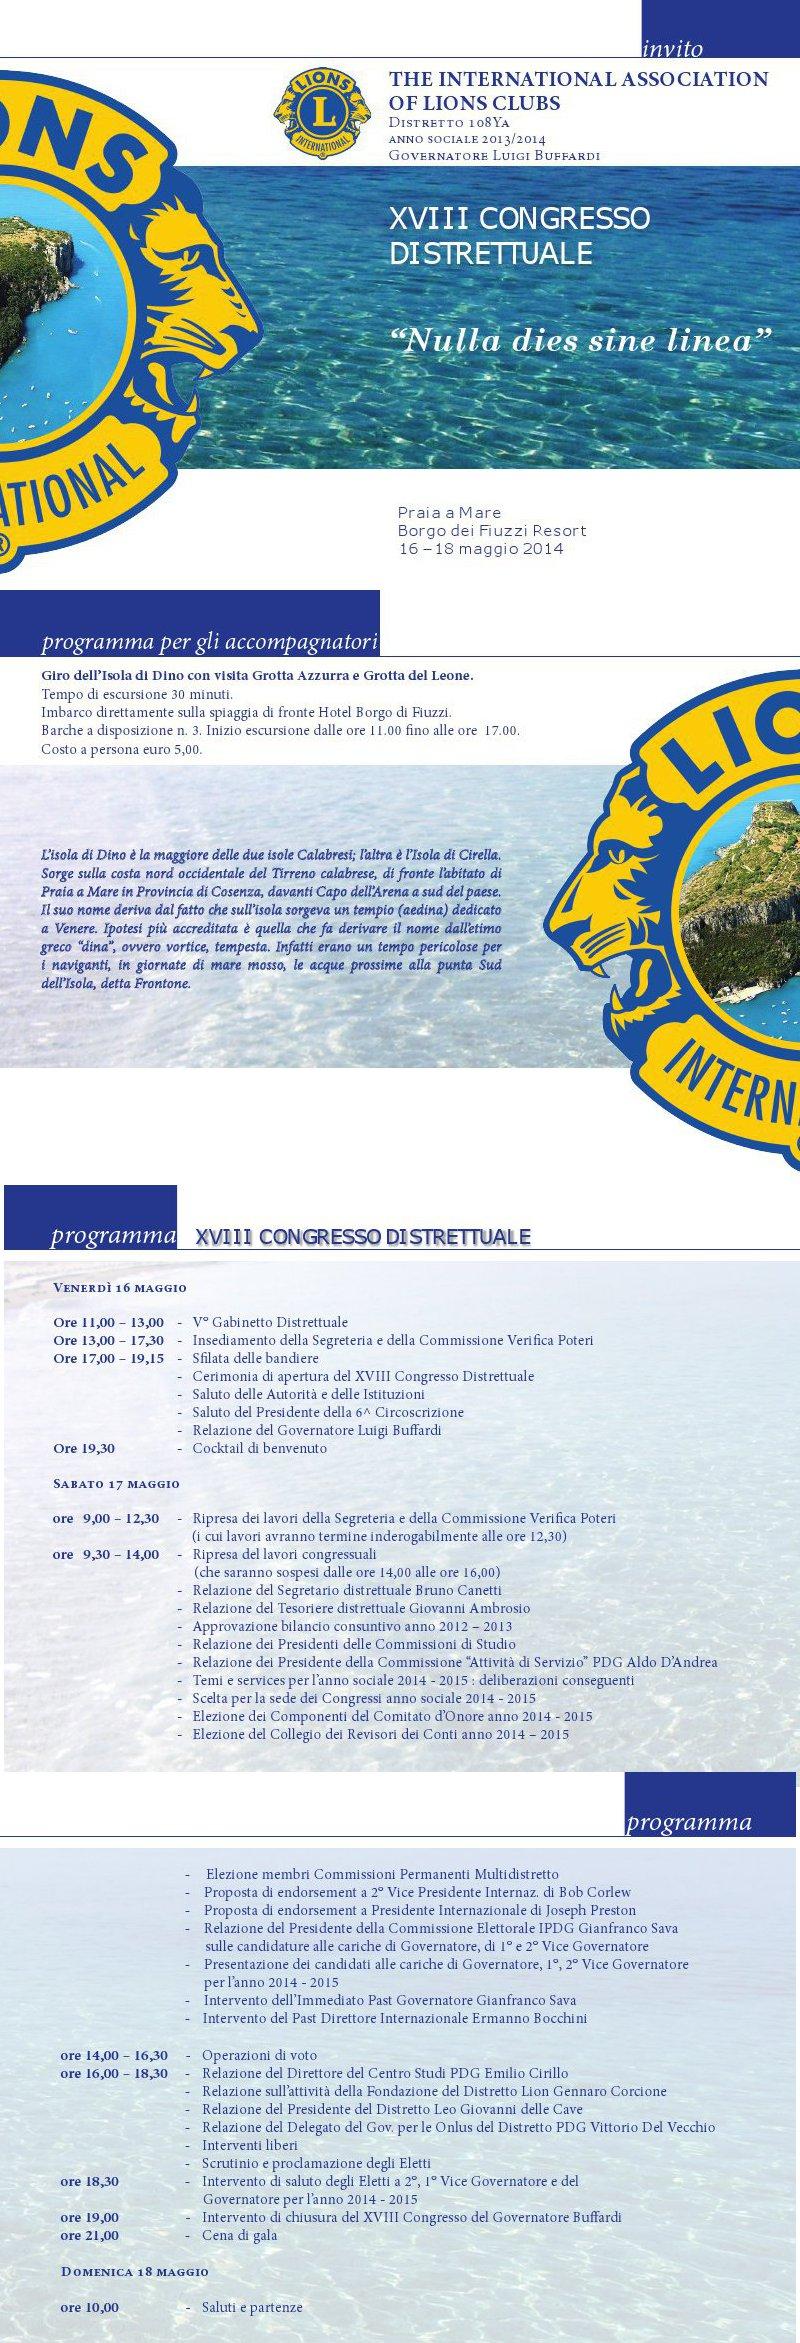 programma_xviii_congresso